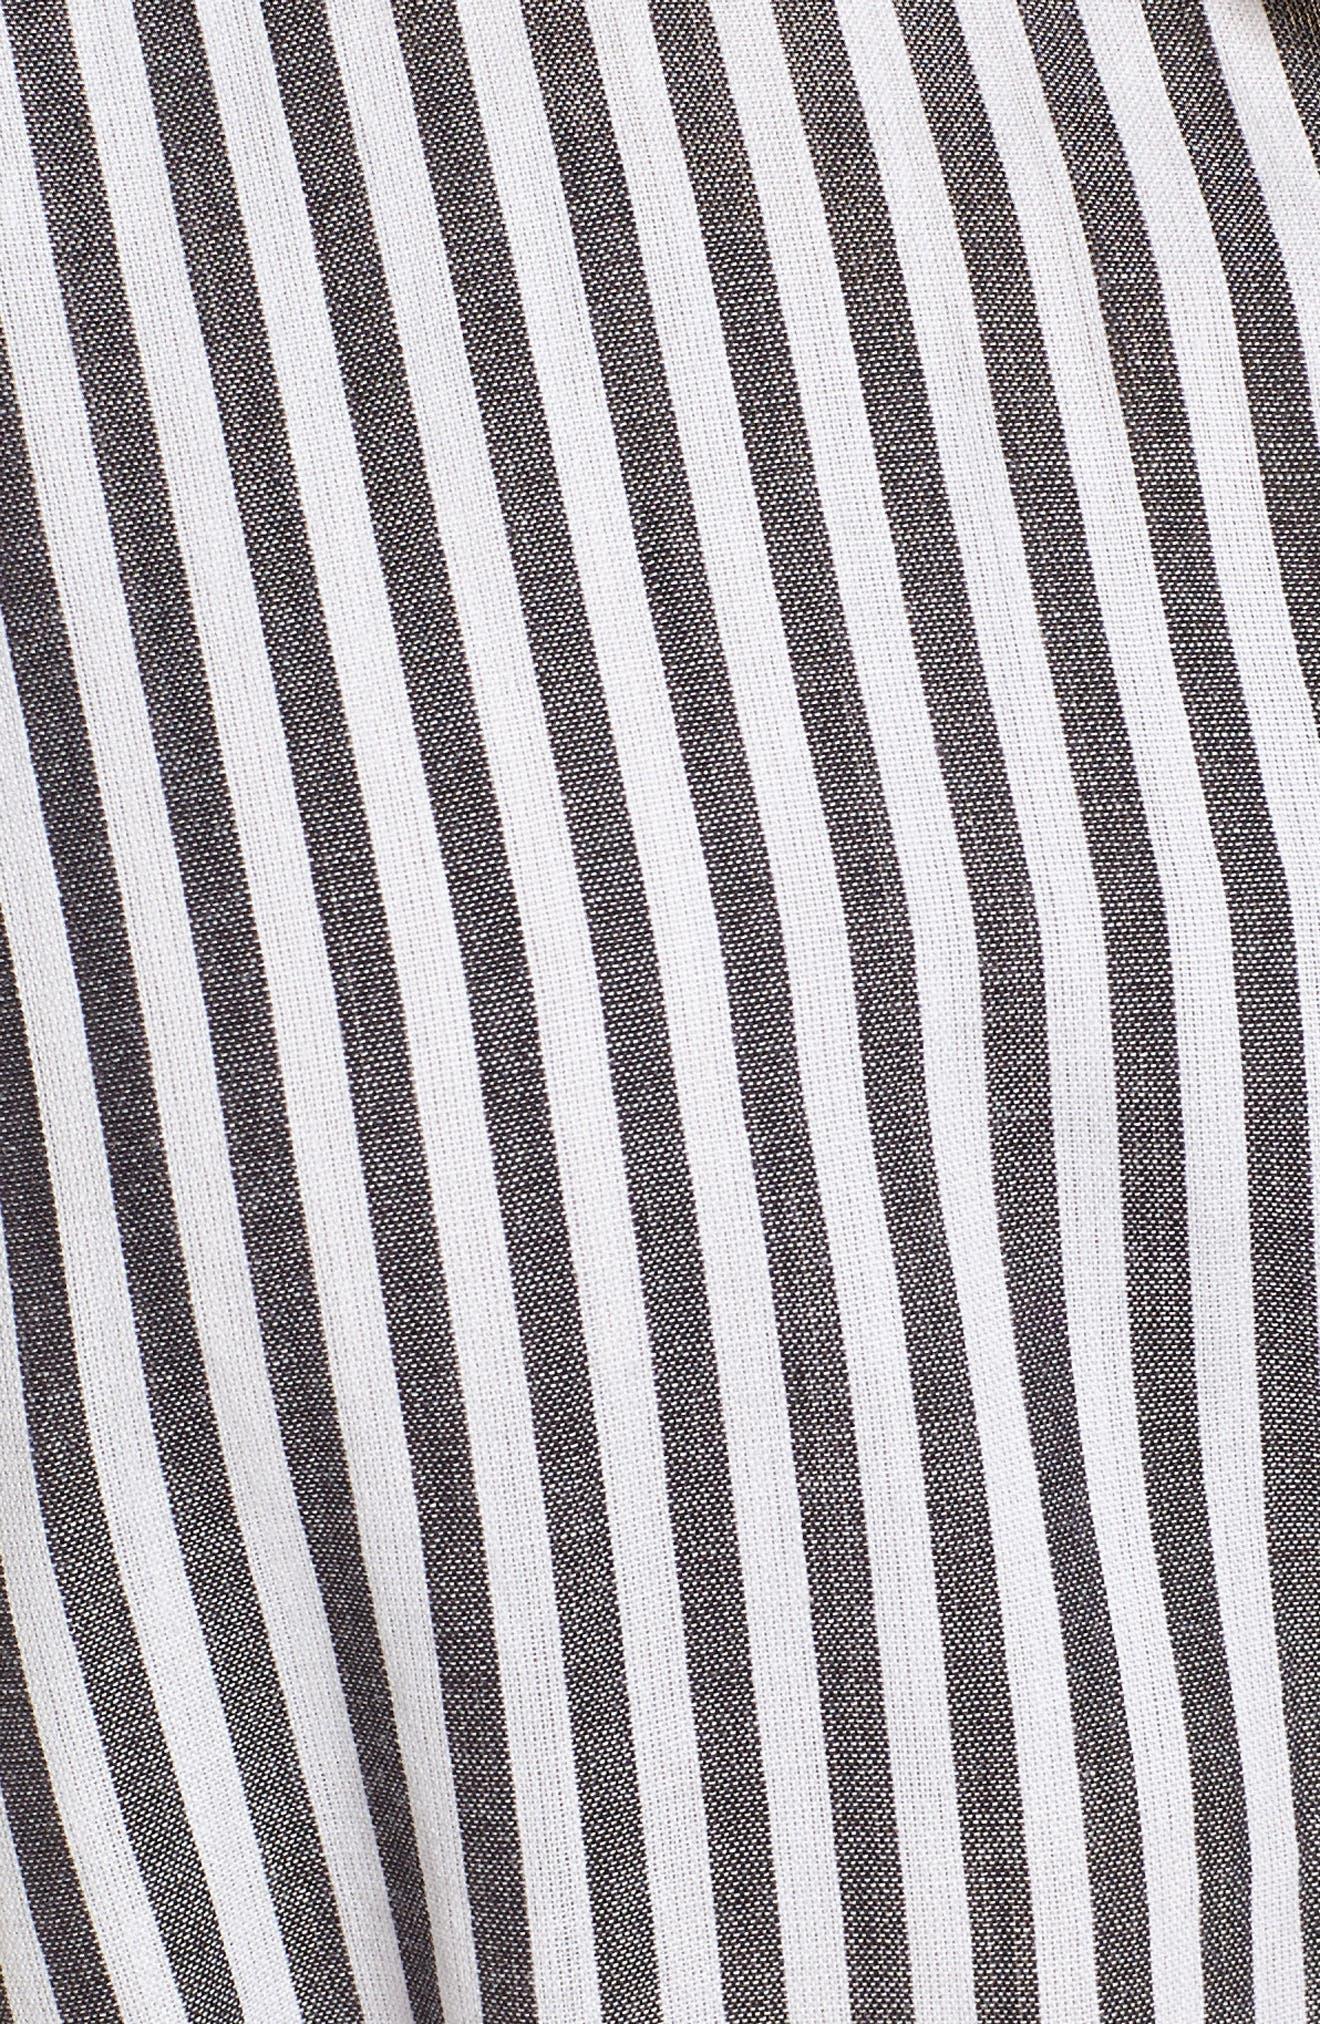 Stripe Belted Cotton Shirtdress,                             Alternate thumbnail 5, color,                             024